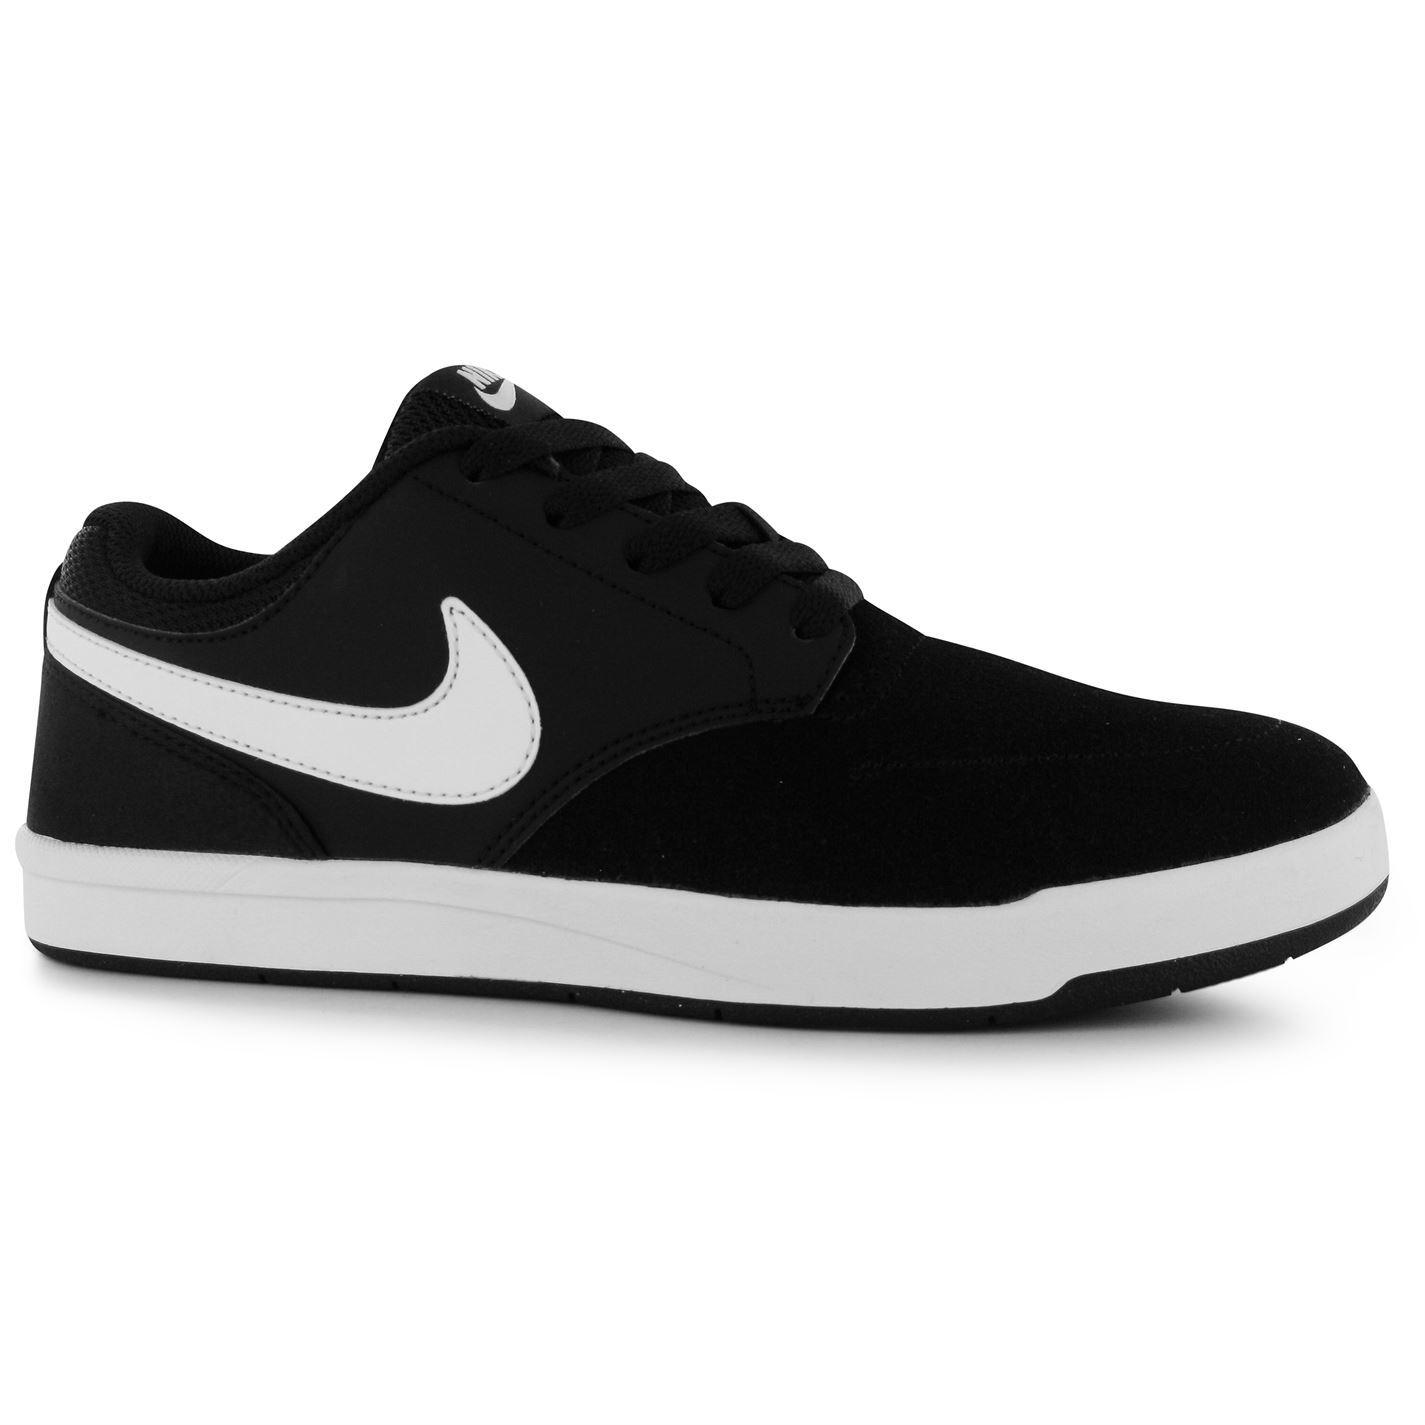 nike sb fokus skate shoes mens black white casual trainers